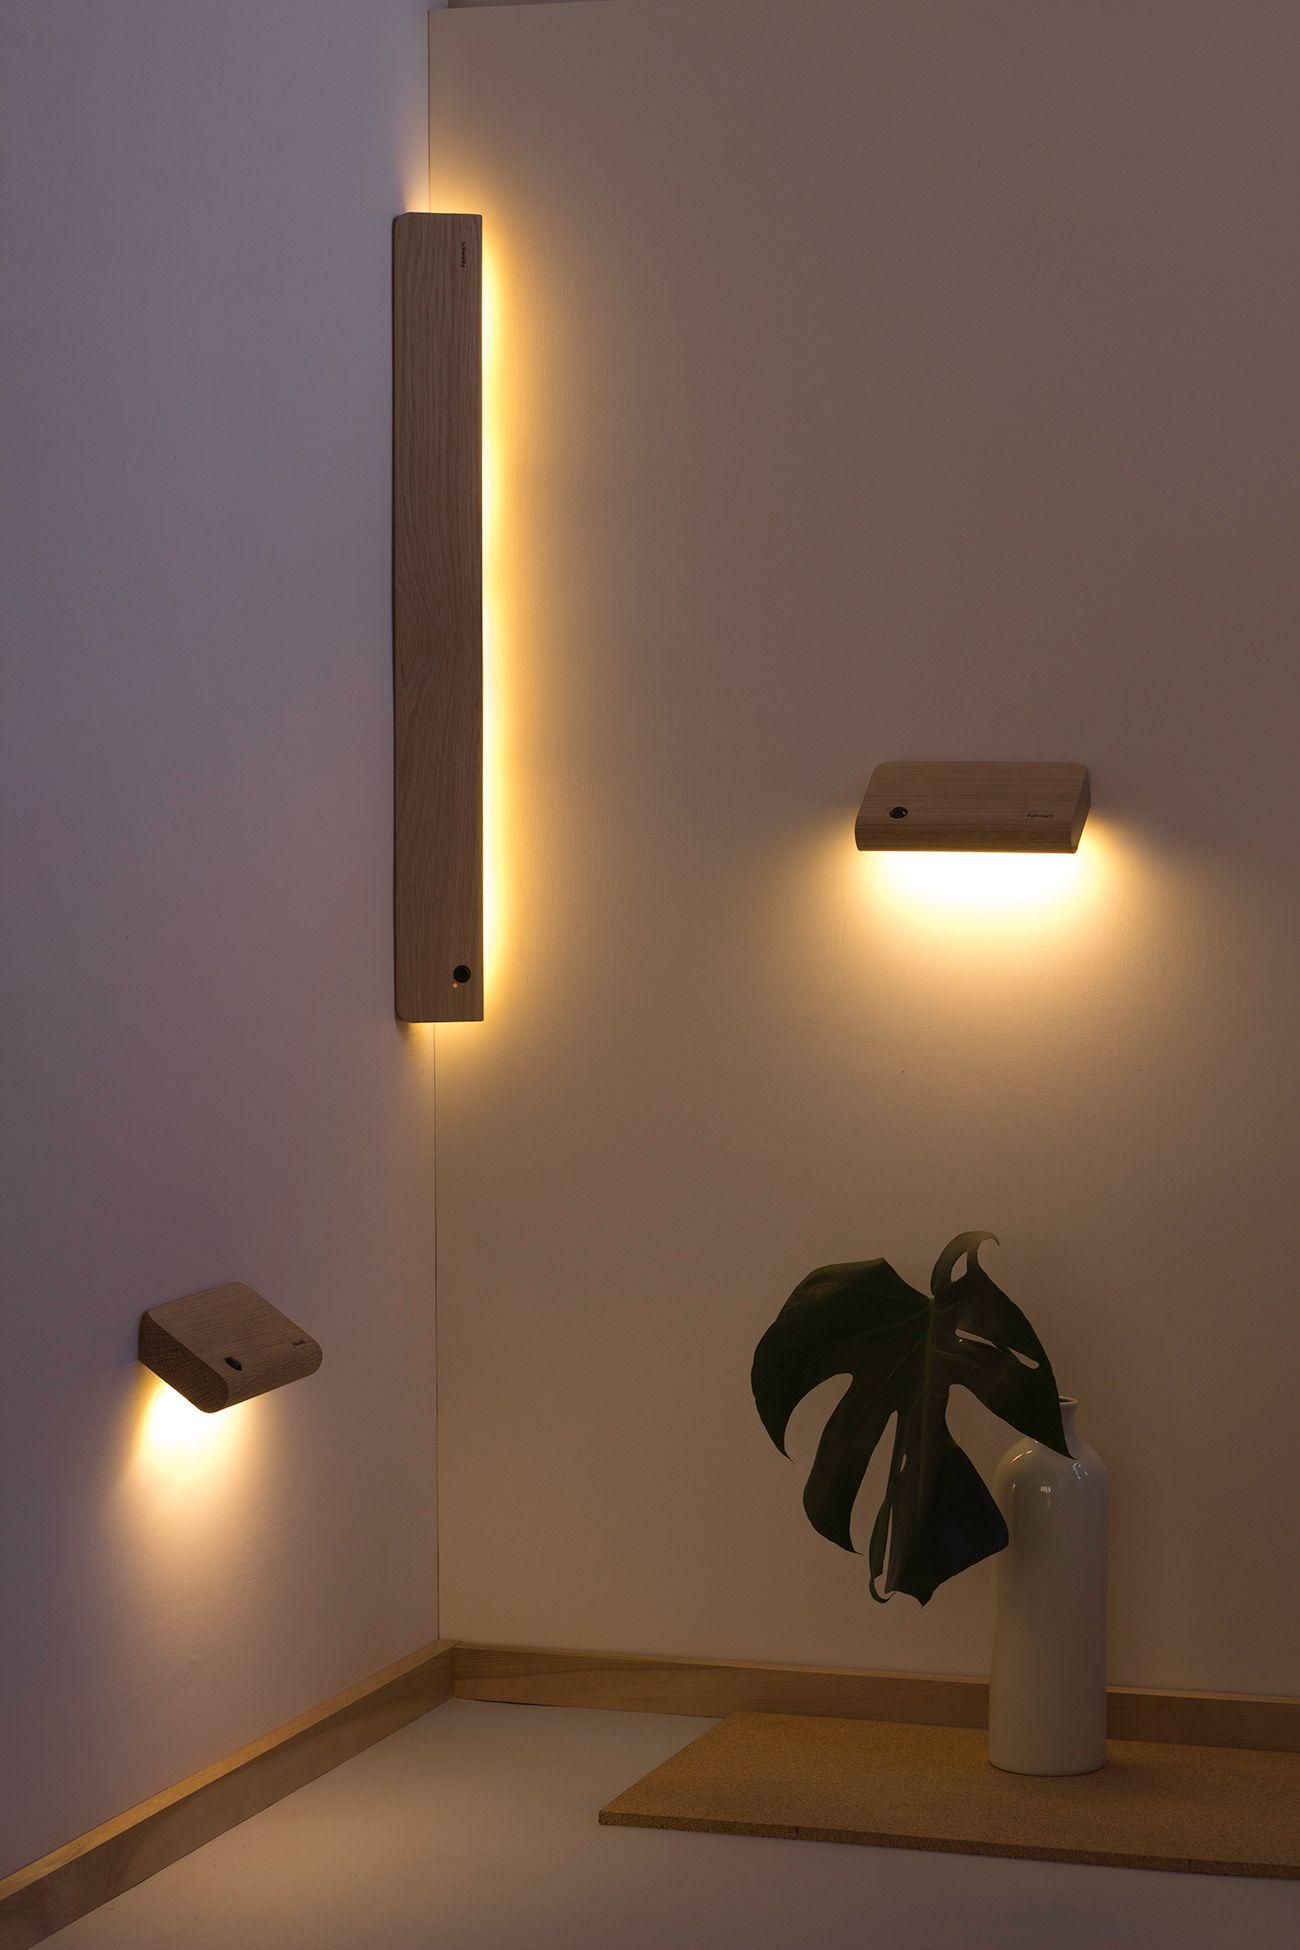 art lighting wireless. Light When You Need - Automatically. Wireless, Motion Sensing Light. Ellum By Feltmark Art Lighting Wireless T